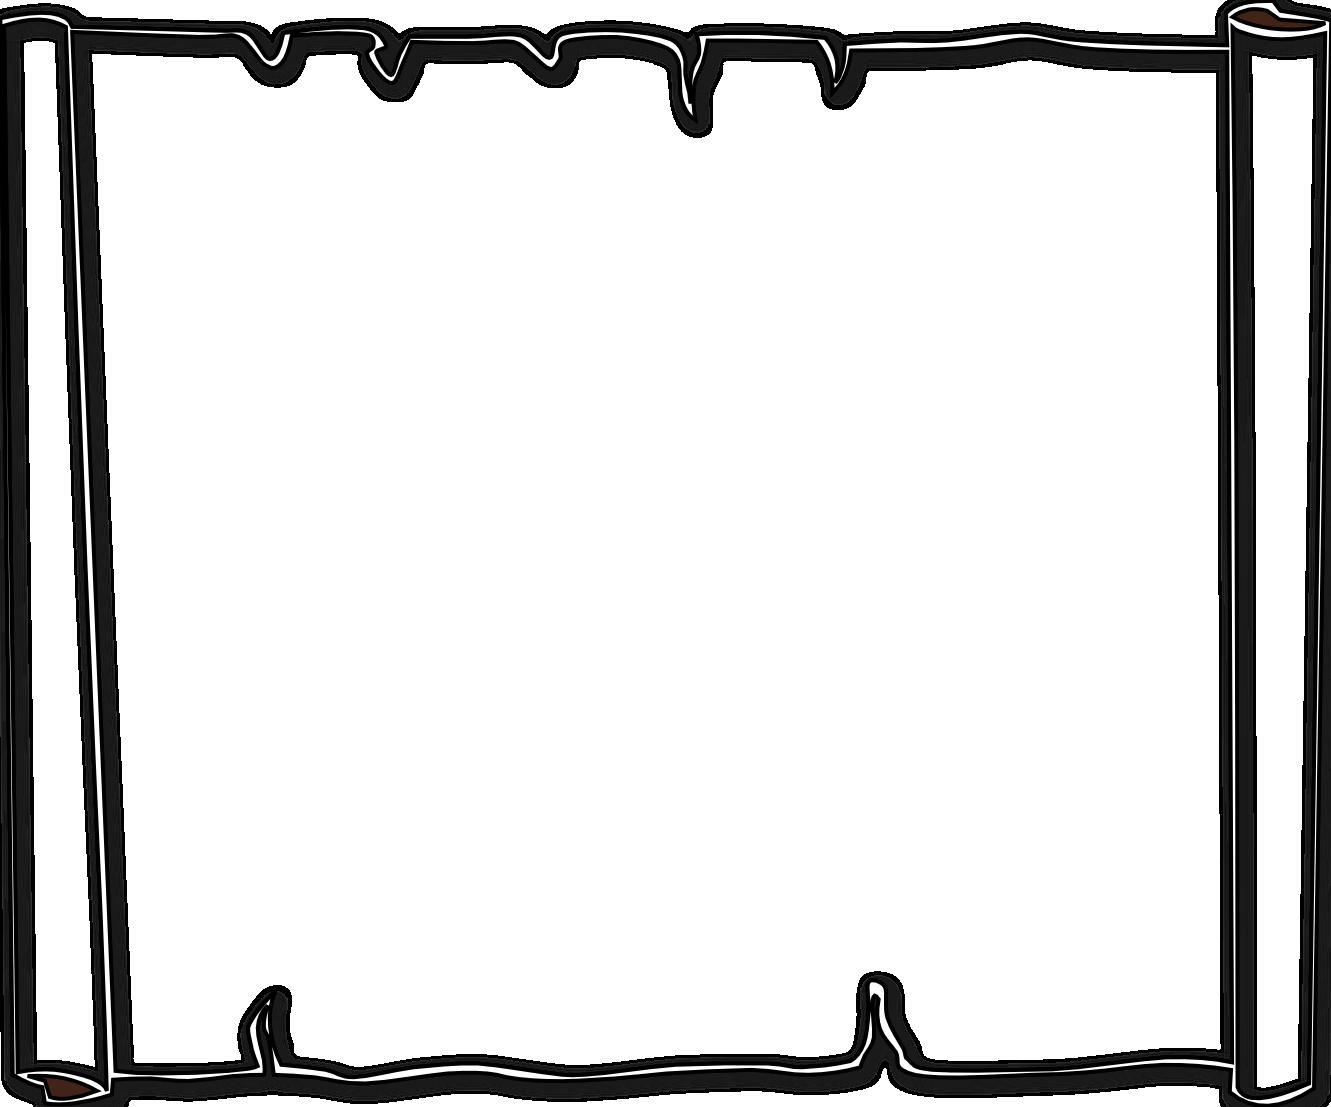 halloween black and white halloween clip art black and white border free 3 - Halloween Clip Art Border